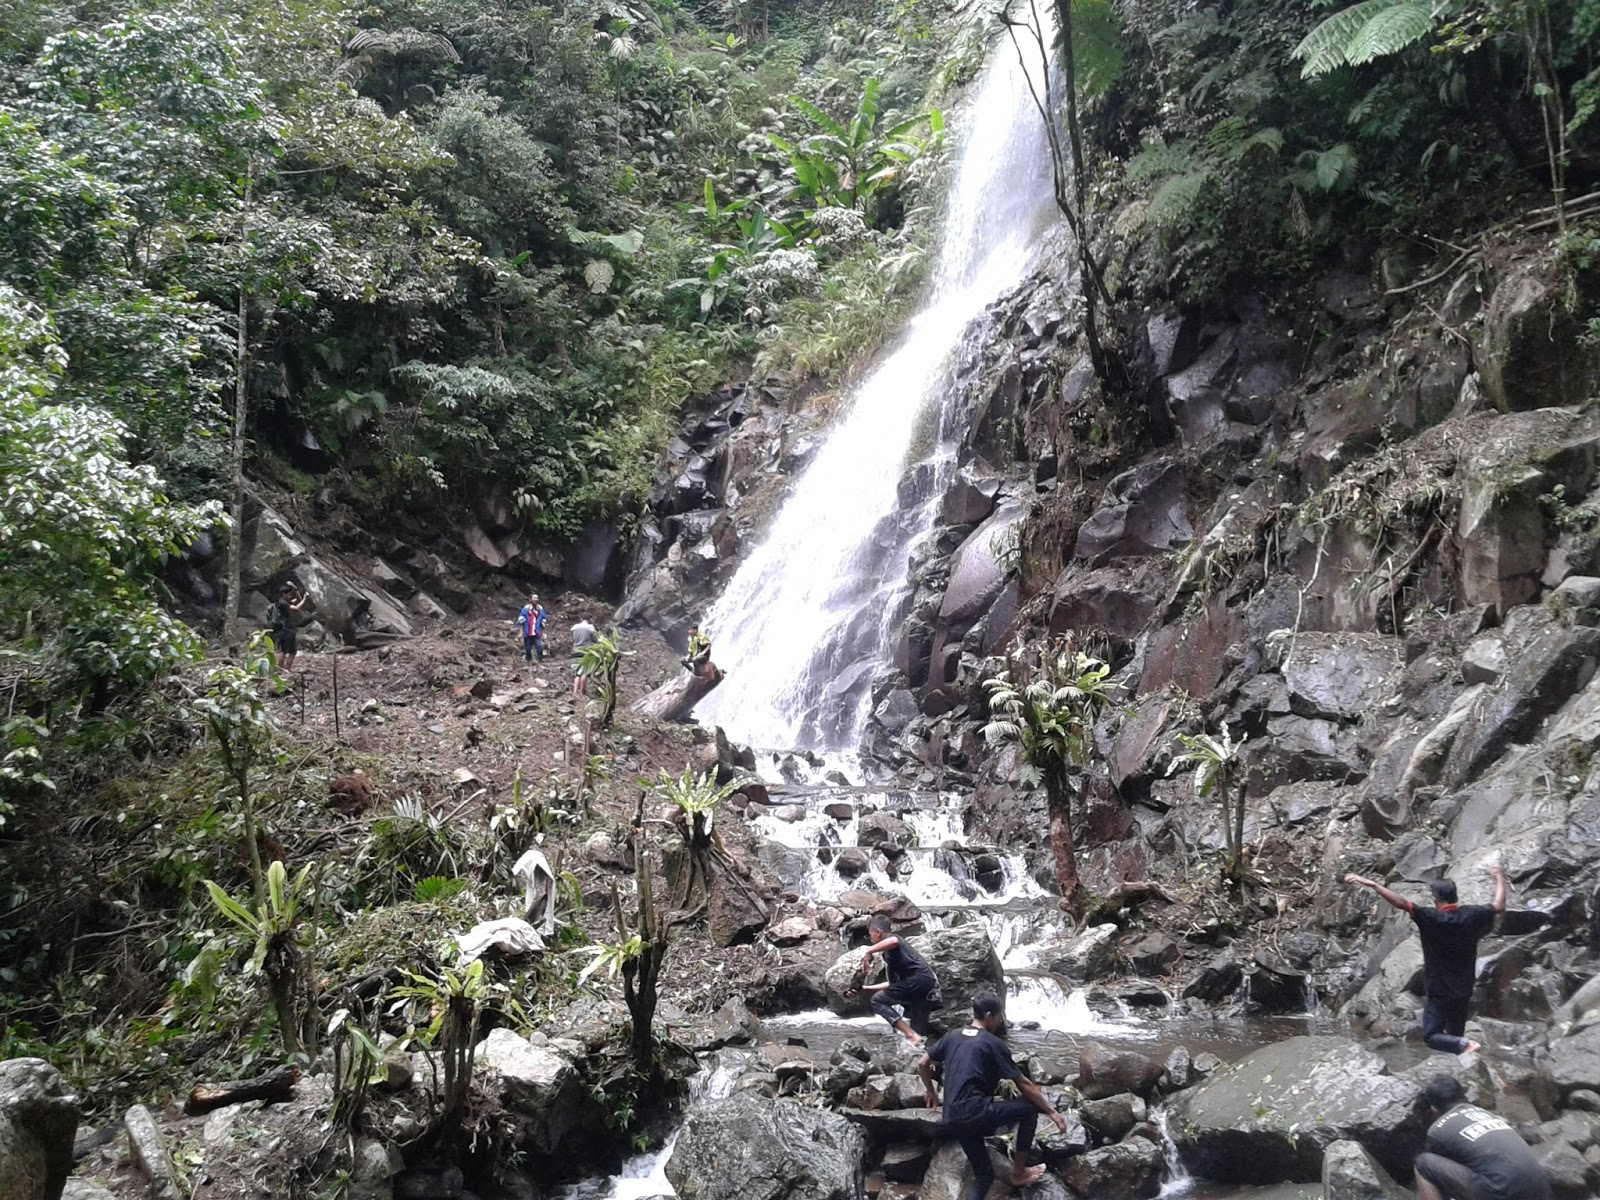 Kehidupan Wisata Desa Geger Kecamatan Sendang Kab Tulungagung Prov Air